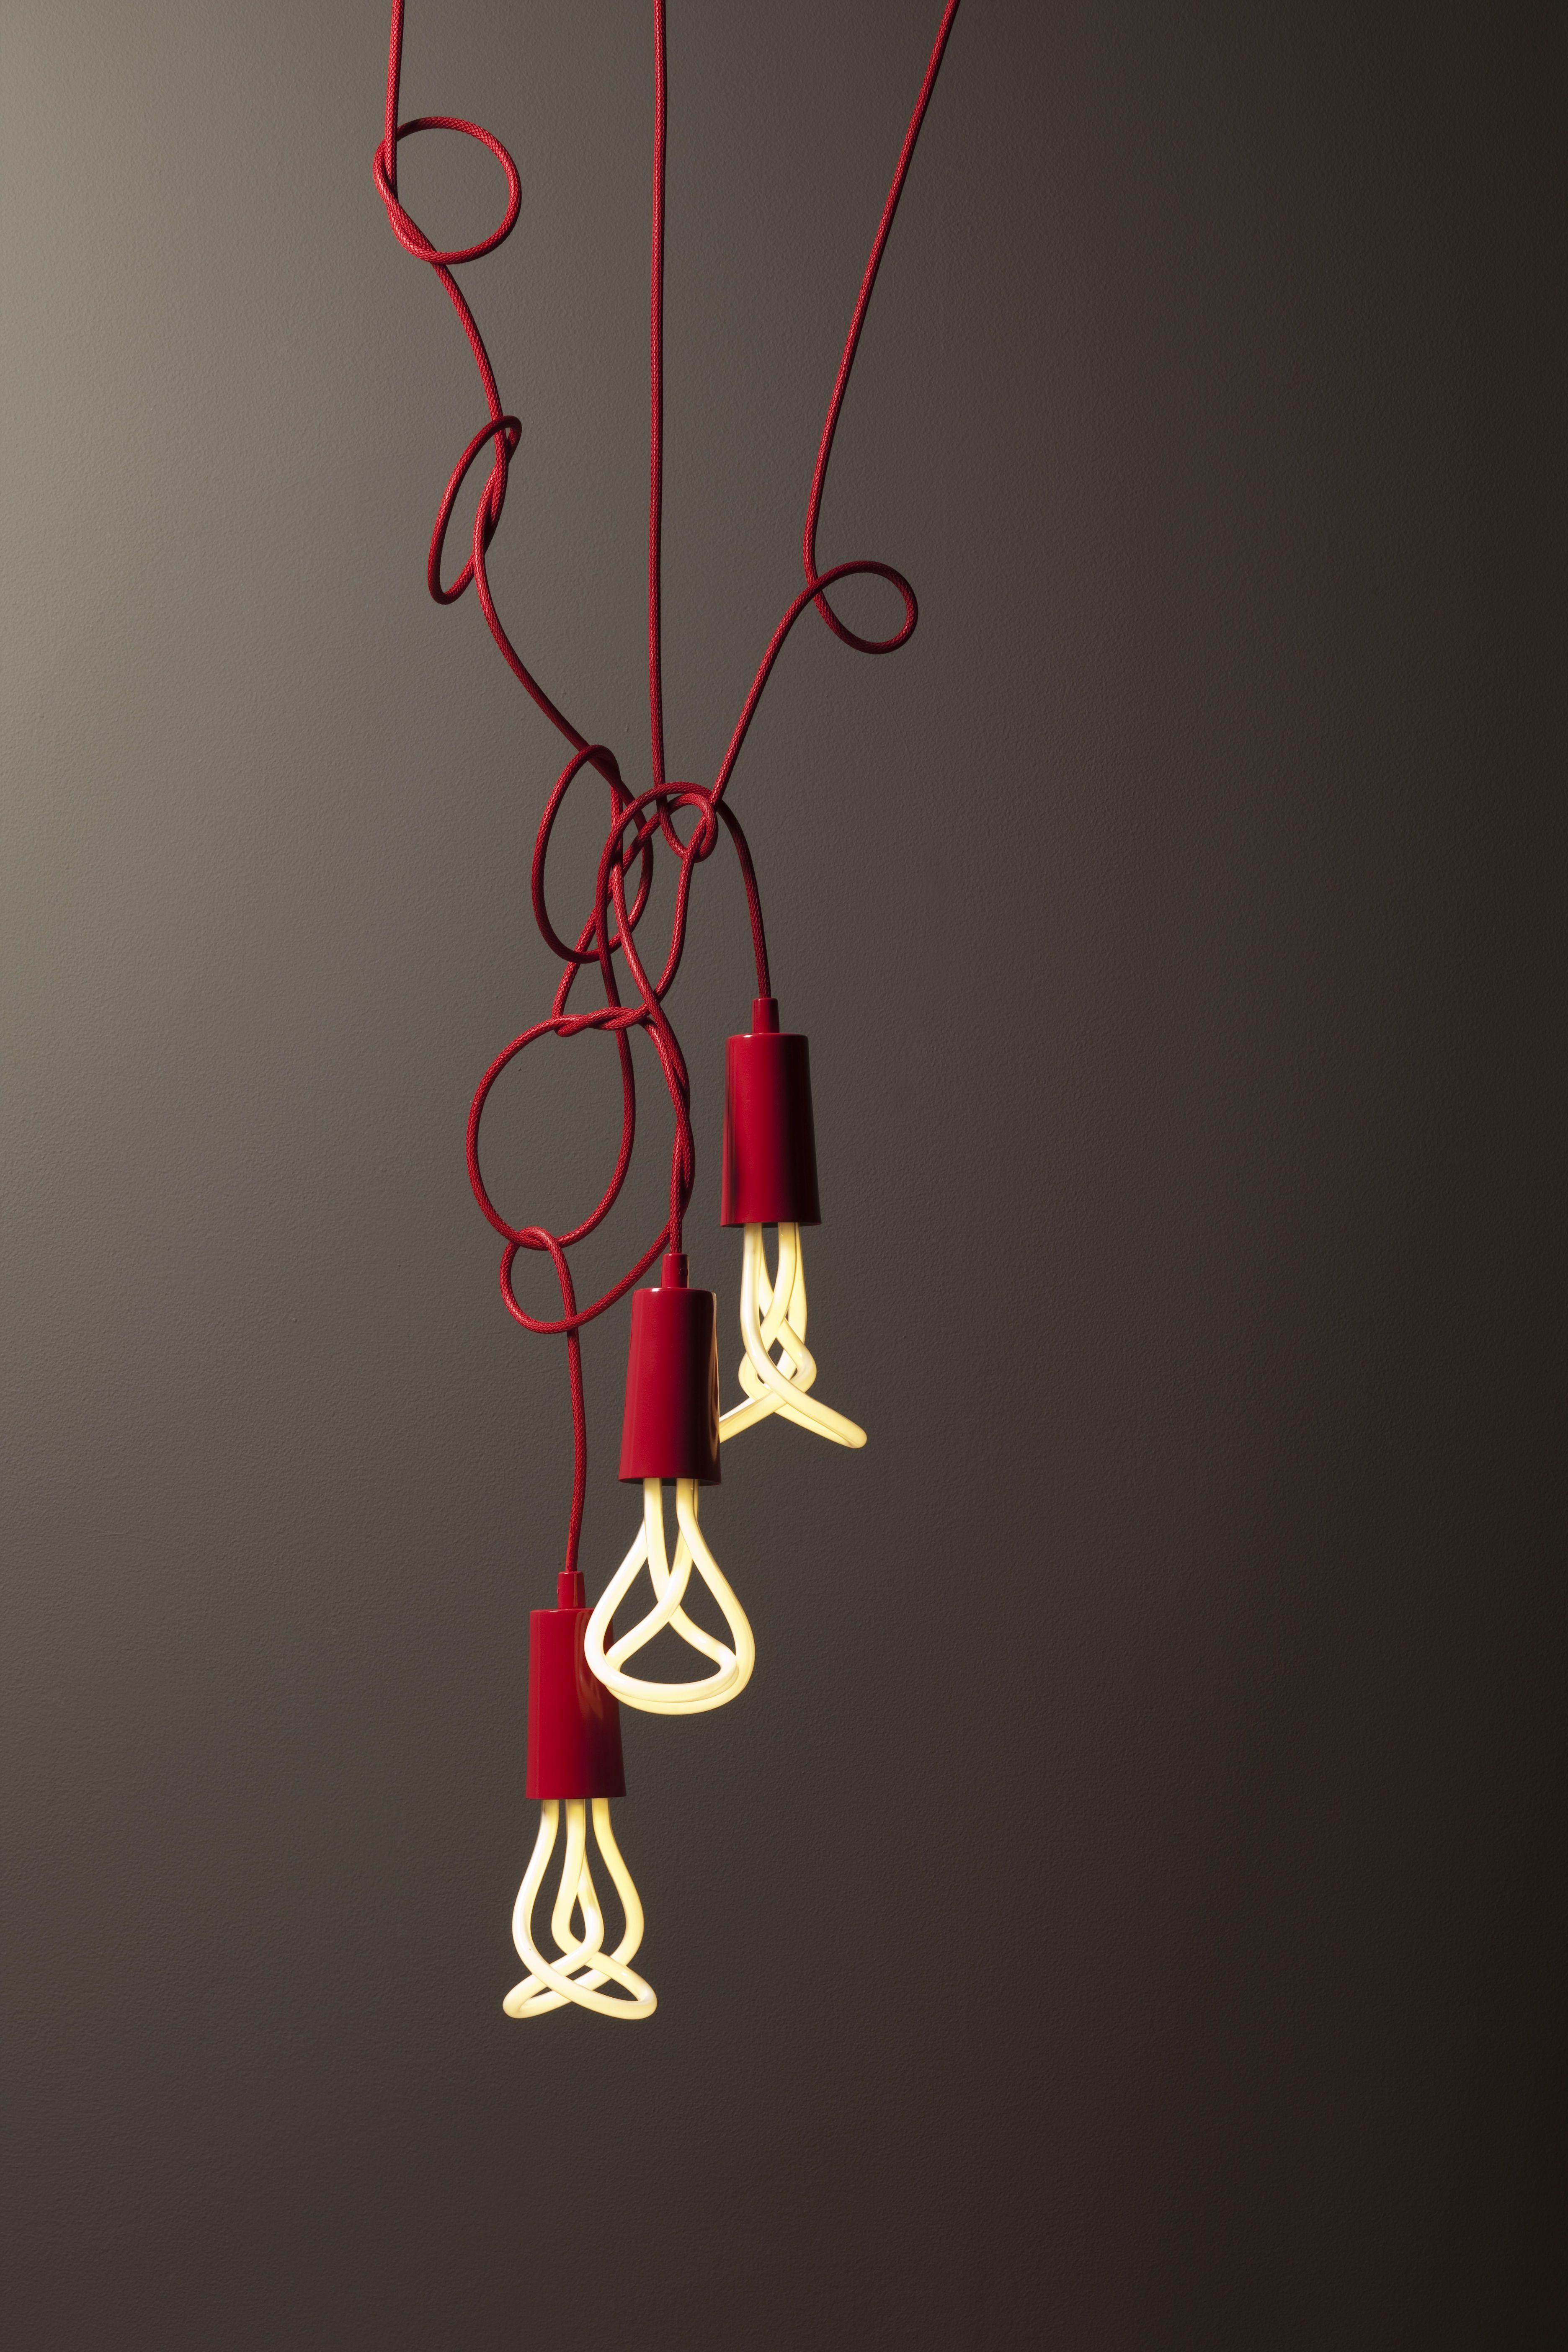 Pin by studiobear sophiebicknell on illuminate design